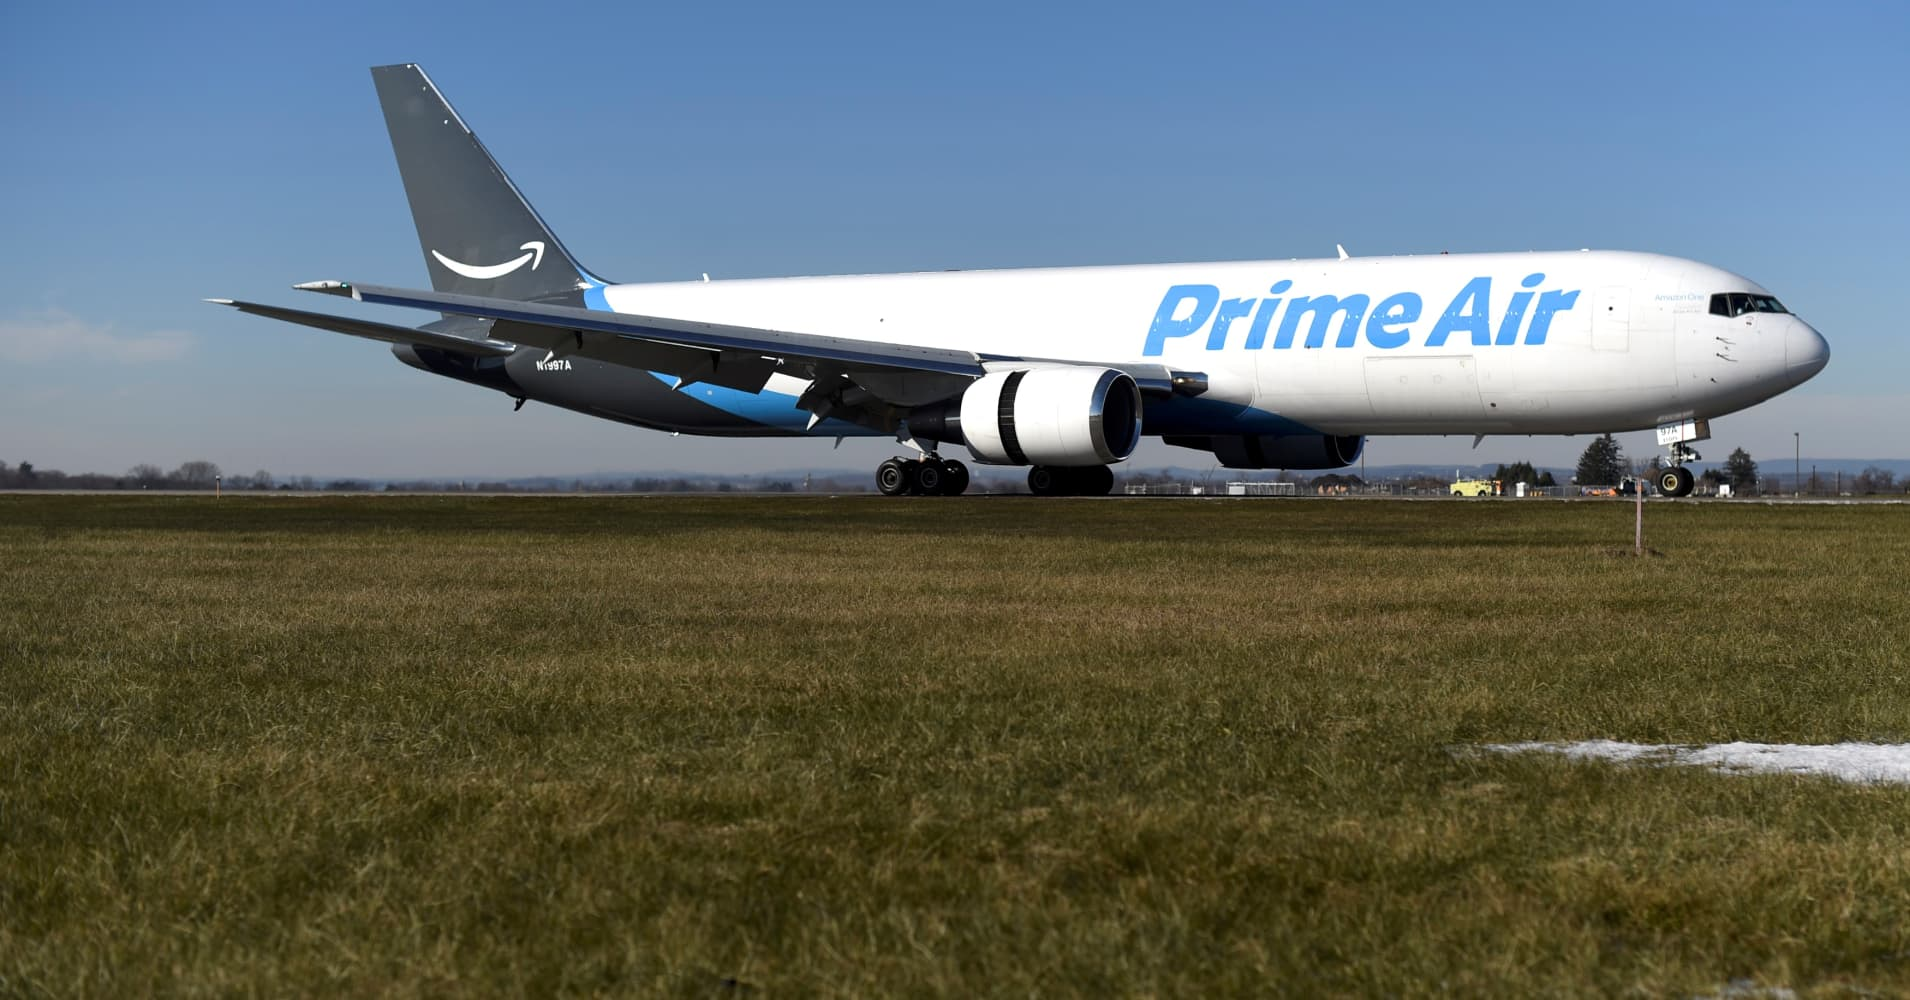 NTSB investigators begin 'painstaking' probe into deadly Amazon cargo jet crash